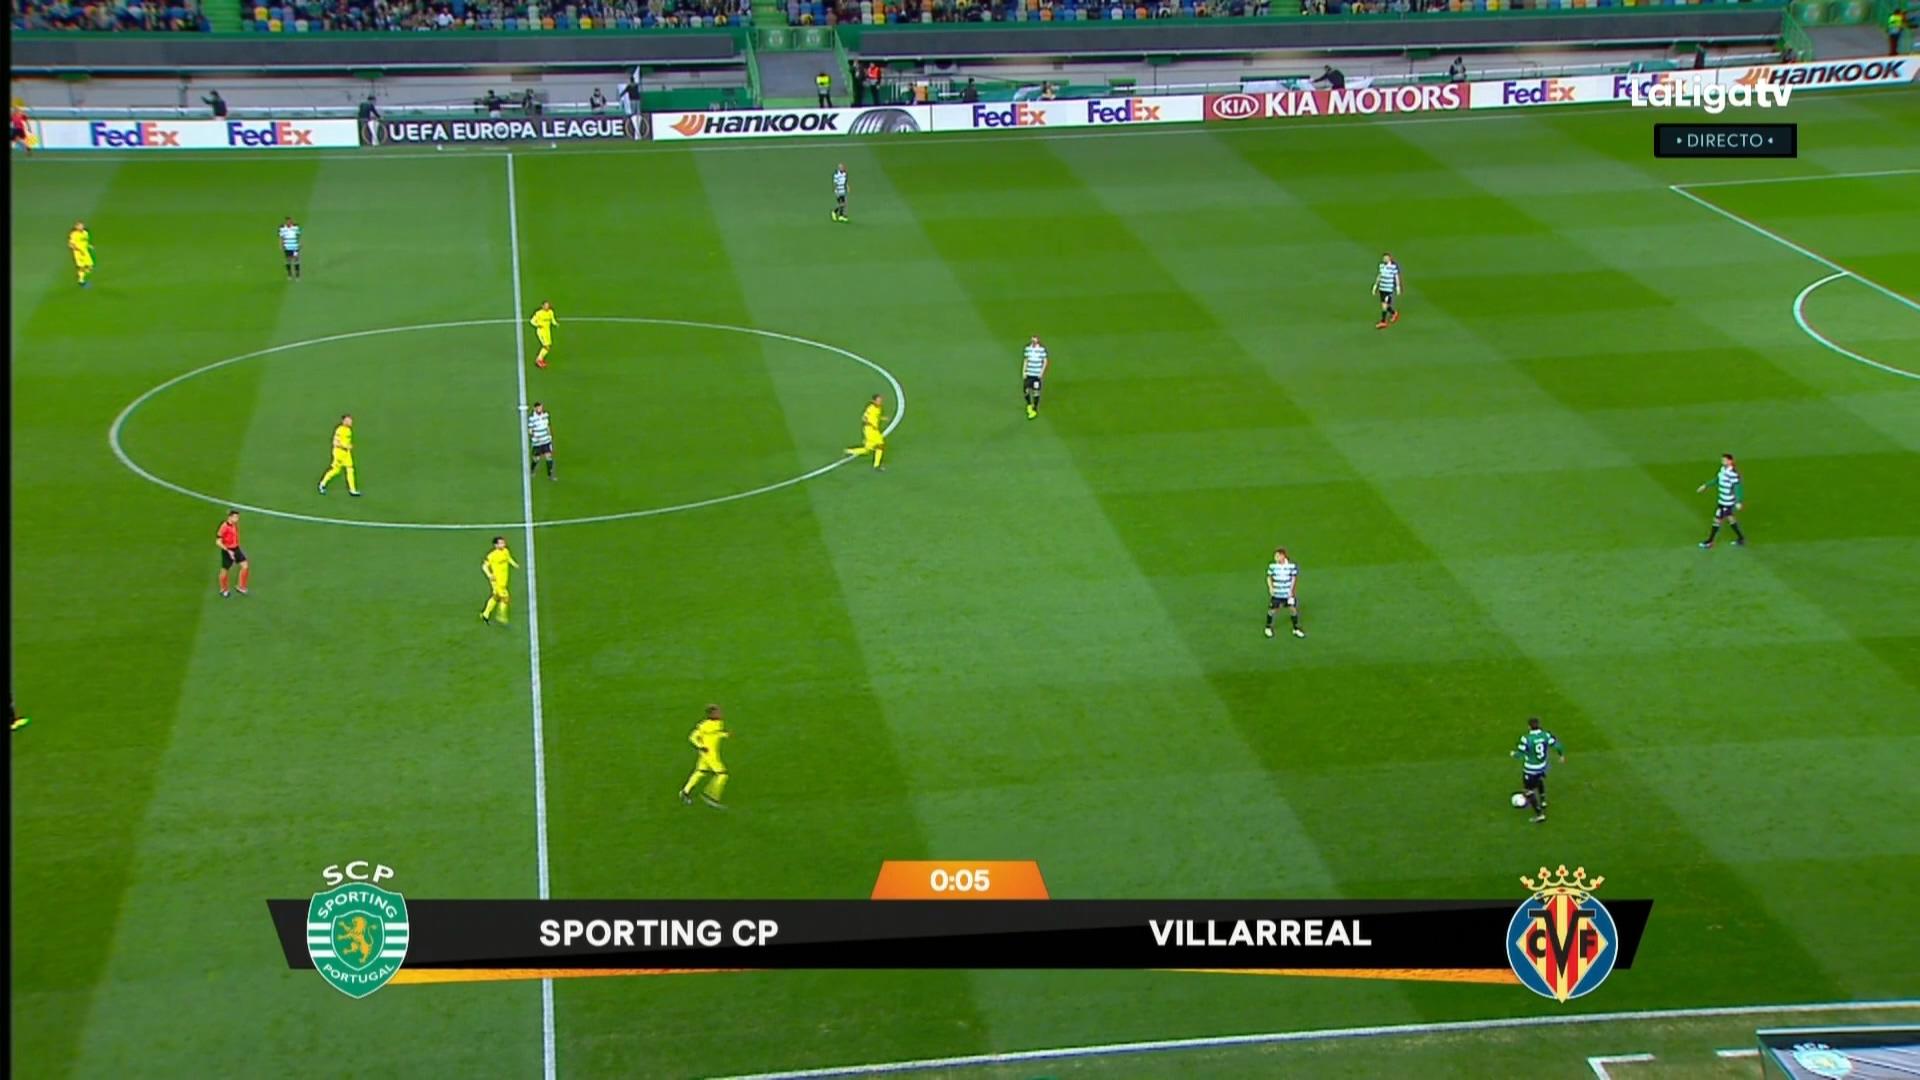 FUTBOL: UEL 18/19 - R32 1st leg - Sporting Lisbon vs